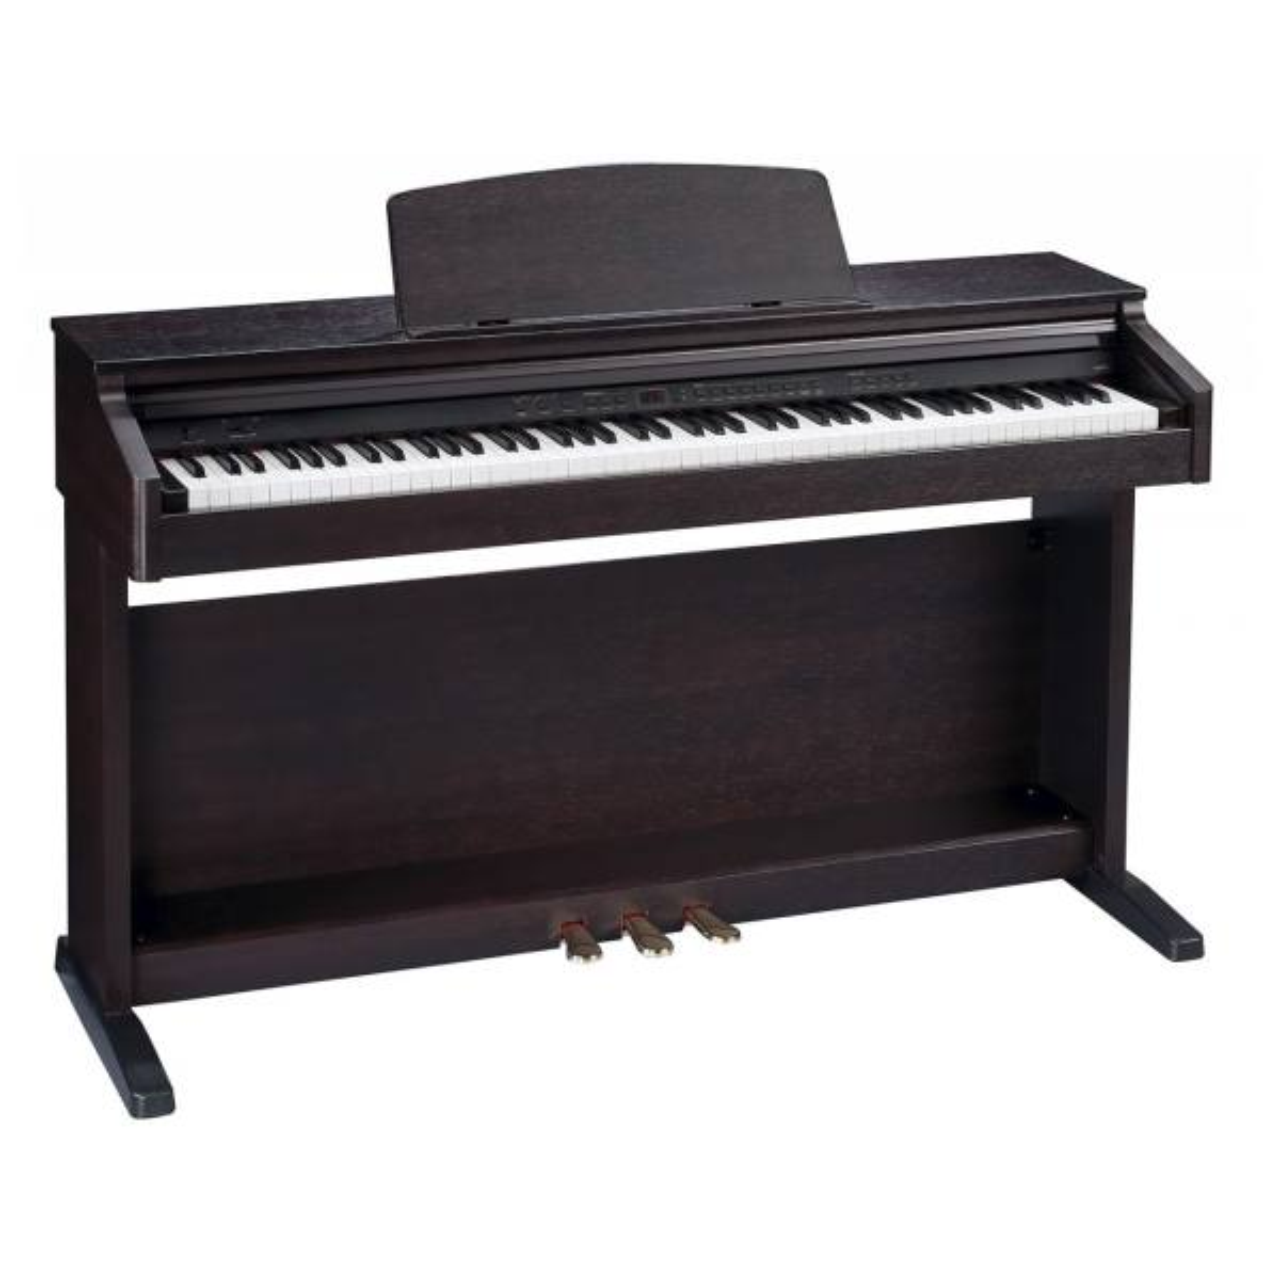 پیانو دیجیتال اورلا مدل CDP10